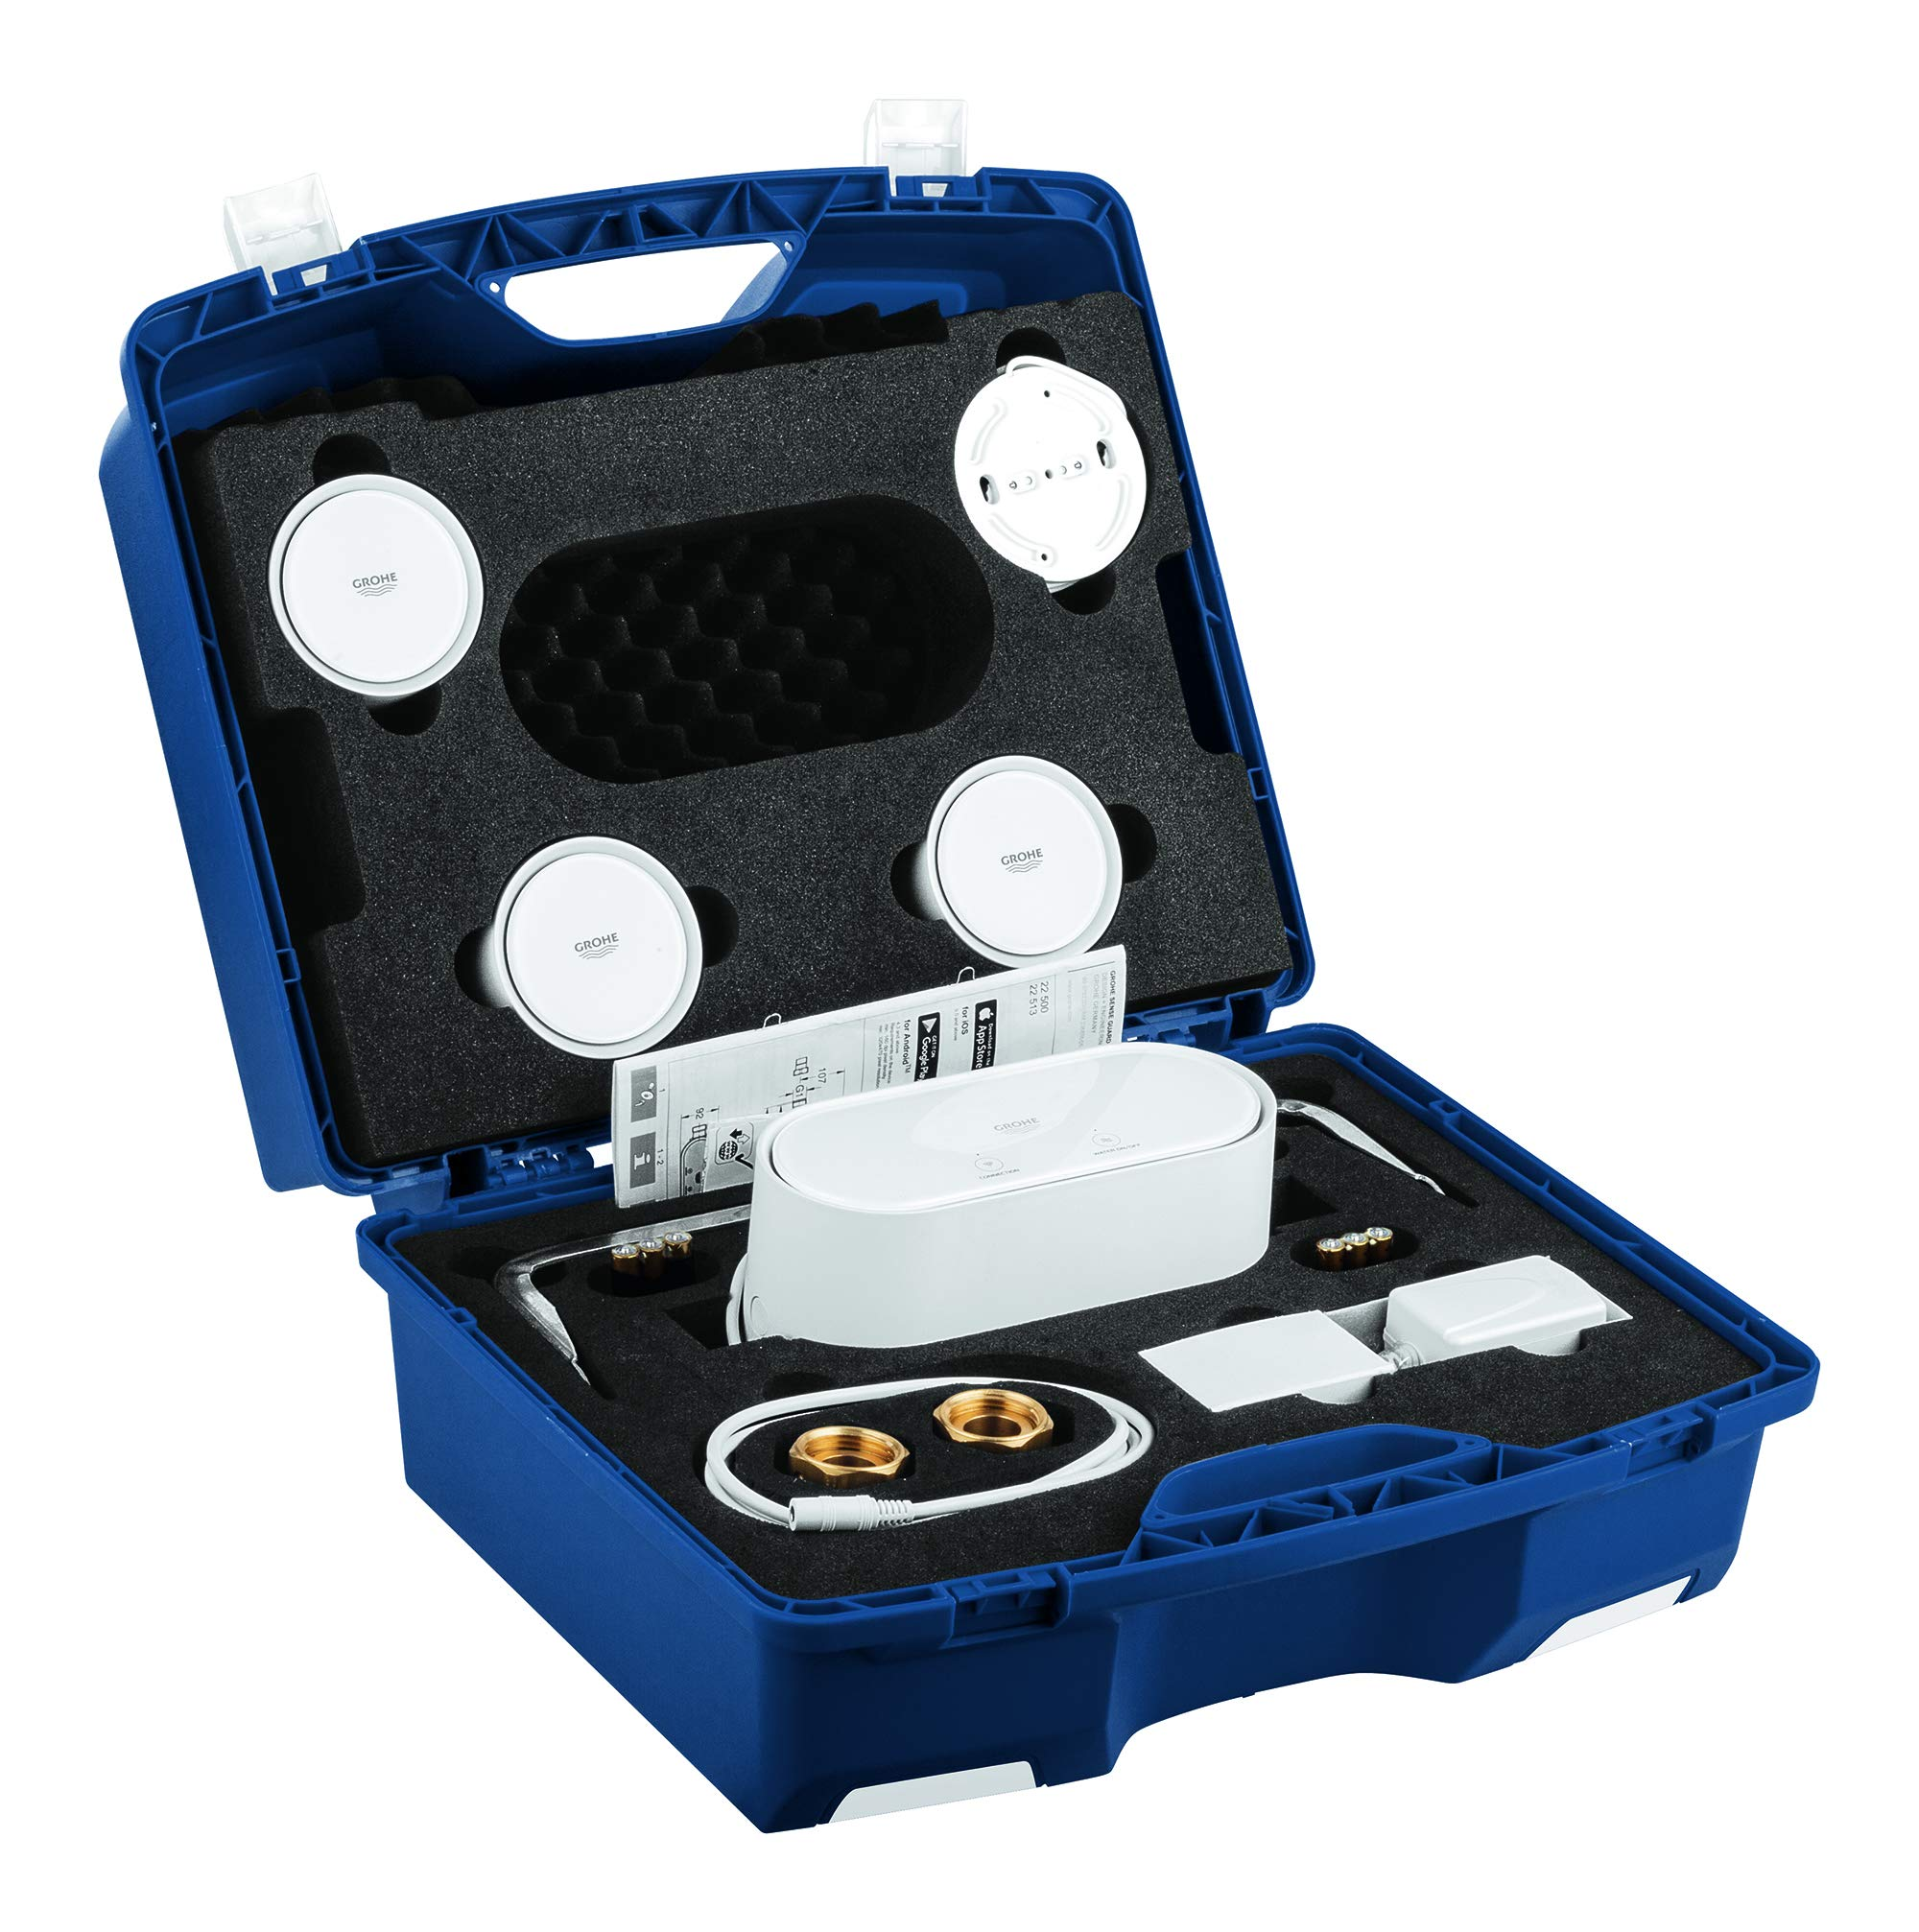 GROHE 22602LN0 Sense Guard Water Security Kit